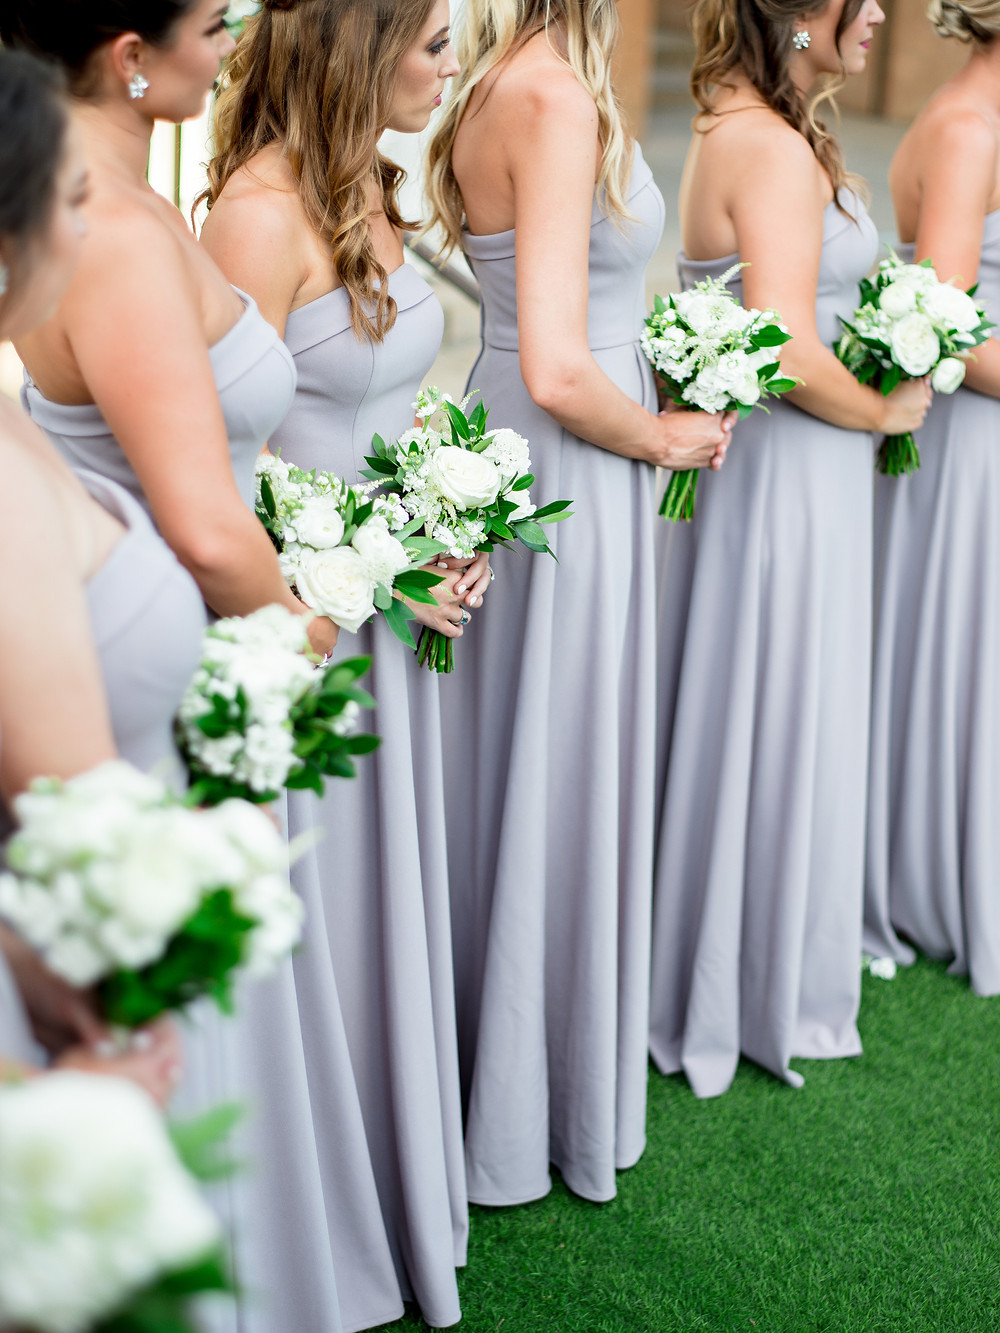 Royal Palms Bridesmaids | Scottsdale, AZ | Elyse Hall Wedding Photography